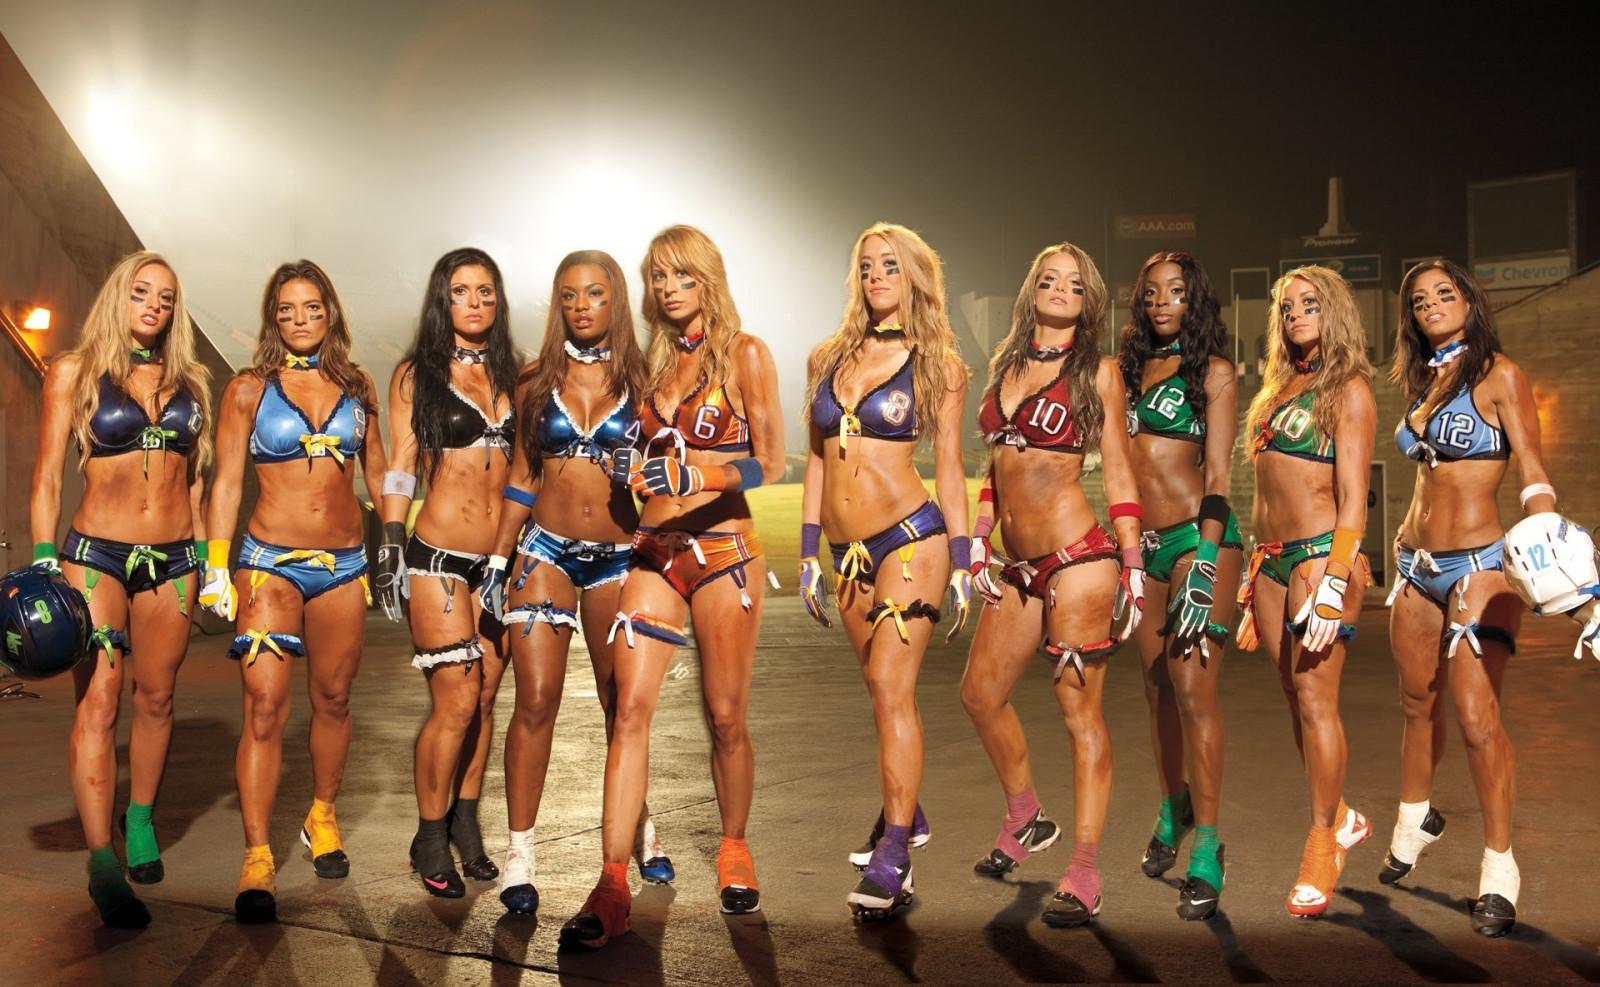 Girls lingerie football nude bikini foil gold